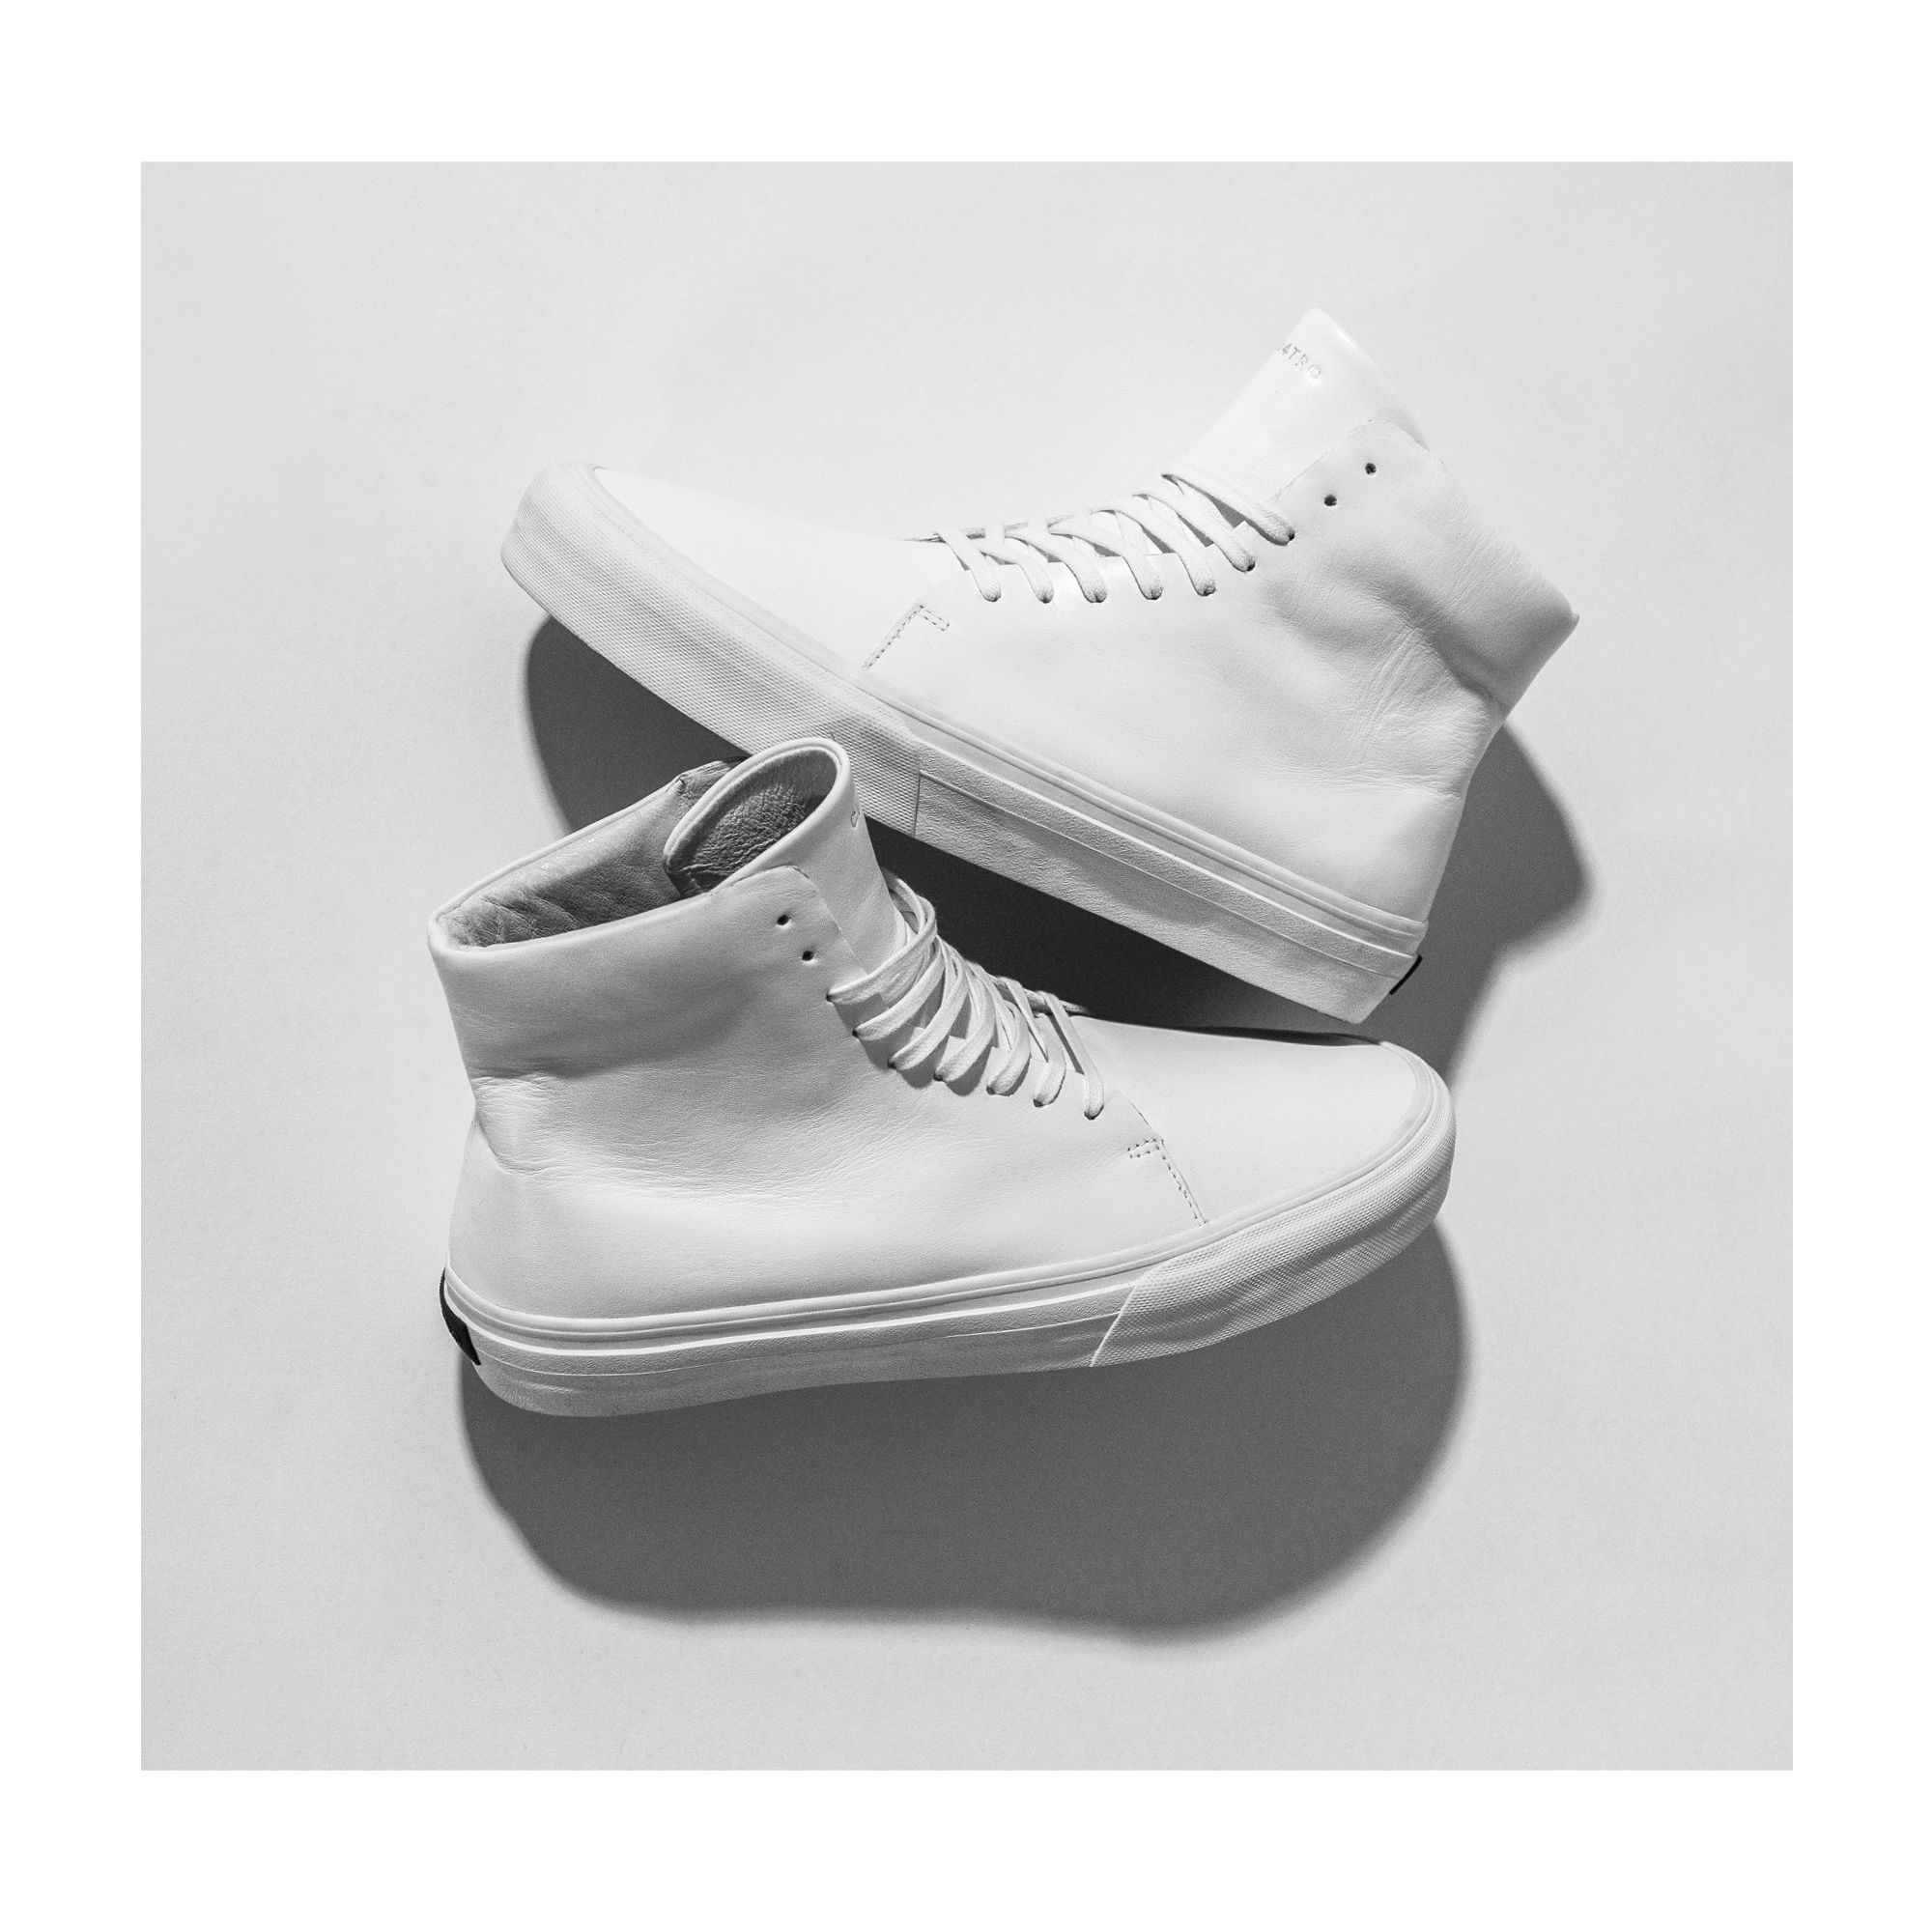 2d48577f2c8d CU4TRO White full grain leather NORRIS  LUXURYSNEAKERS  HIGHTOPS  SNEAKERS   KICKS  KOTD  FASHION  01234